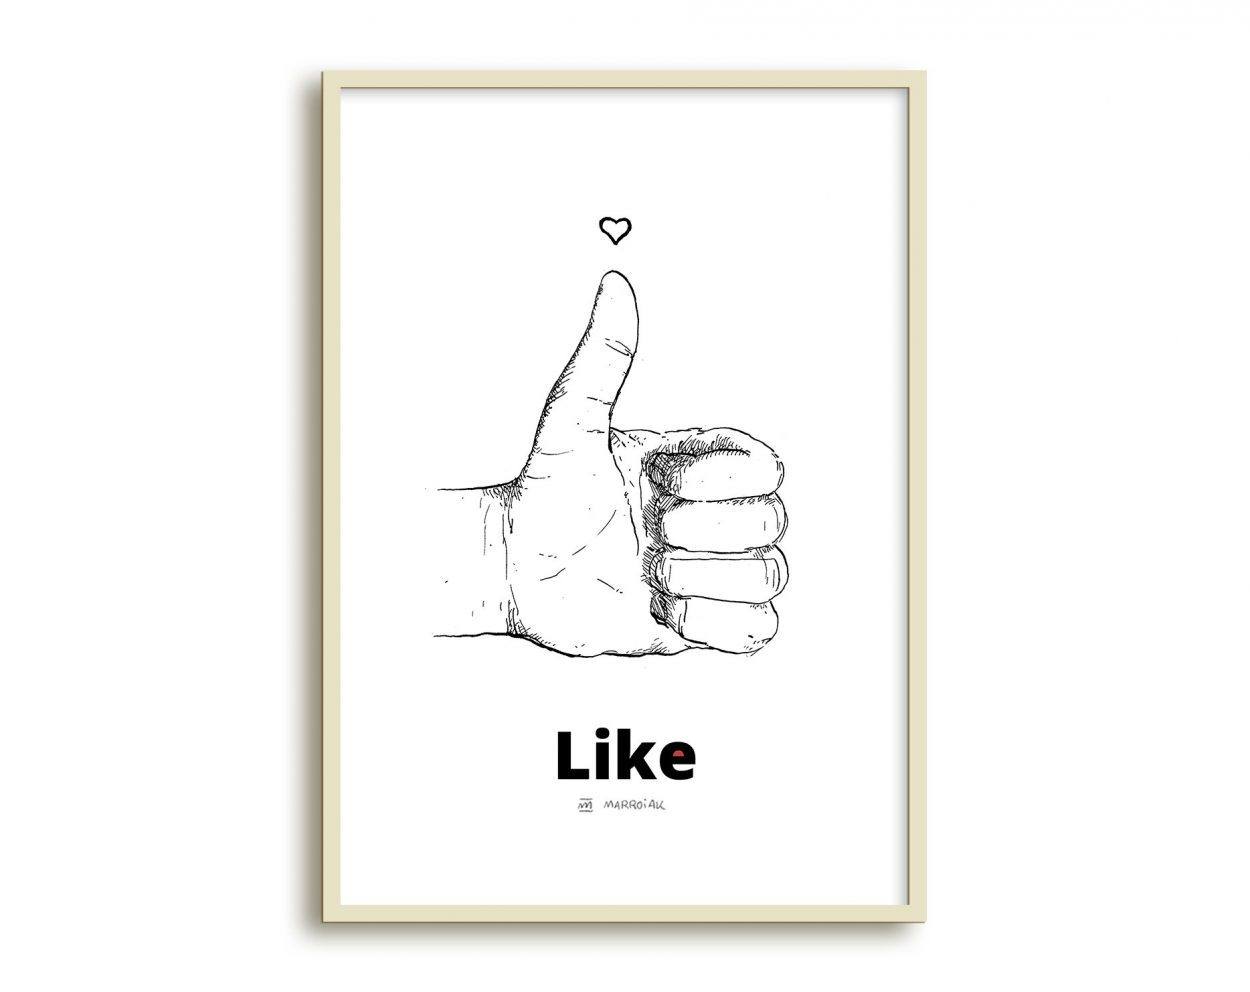 Dibujo mano Like de Facebook